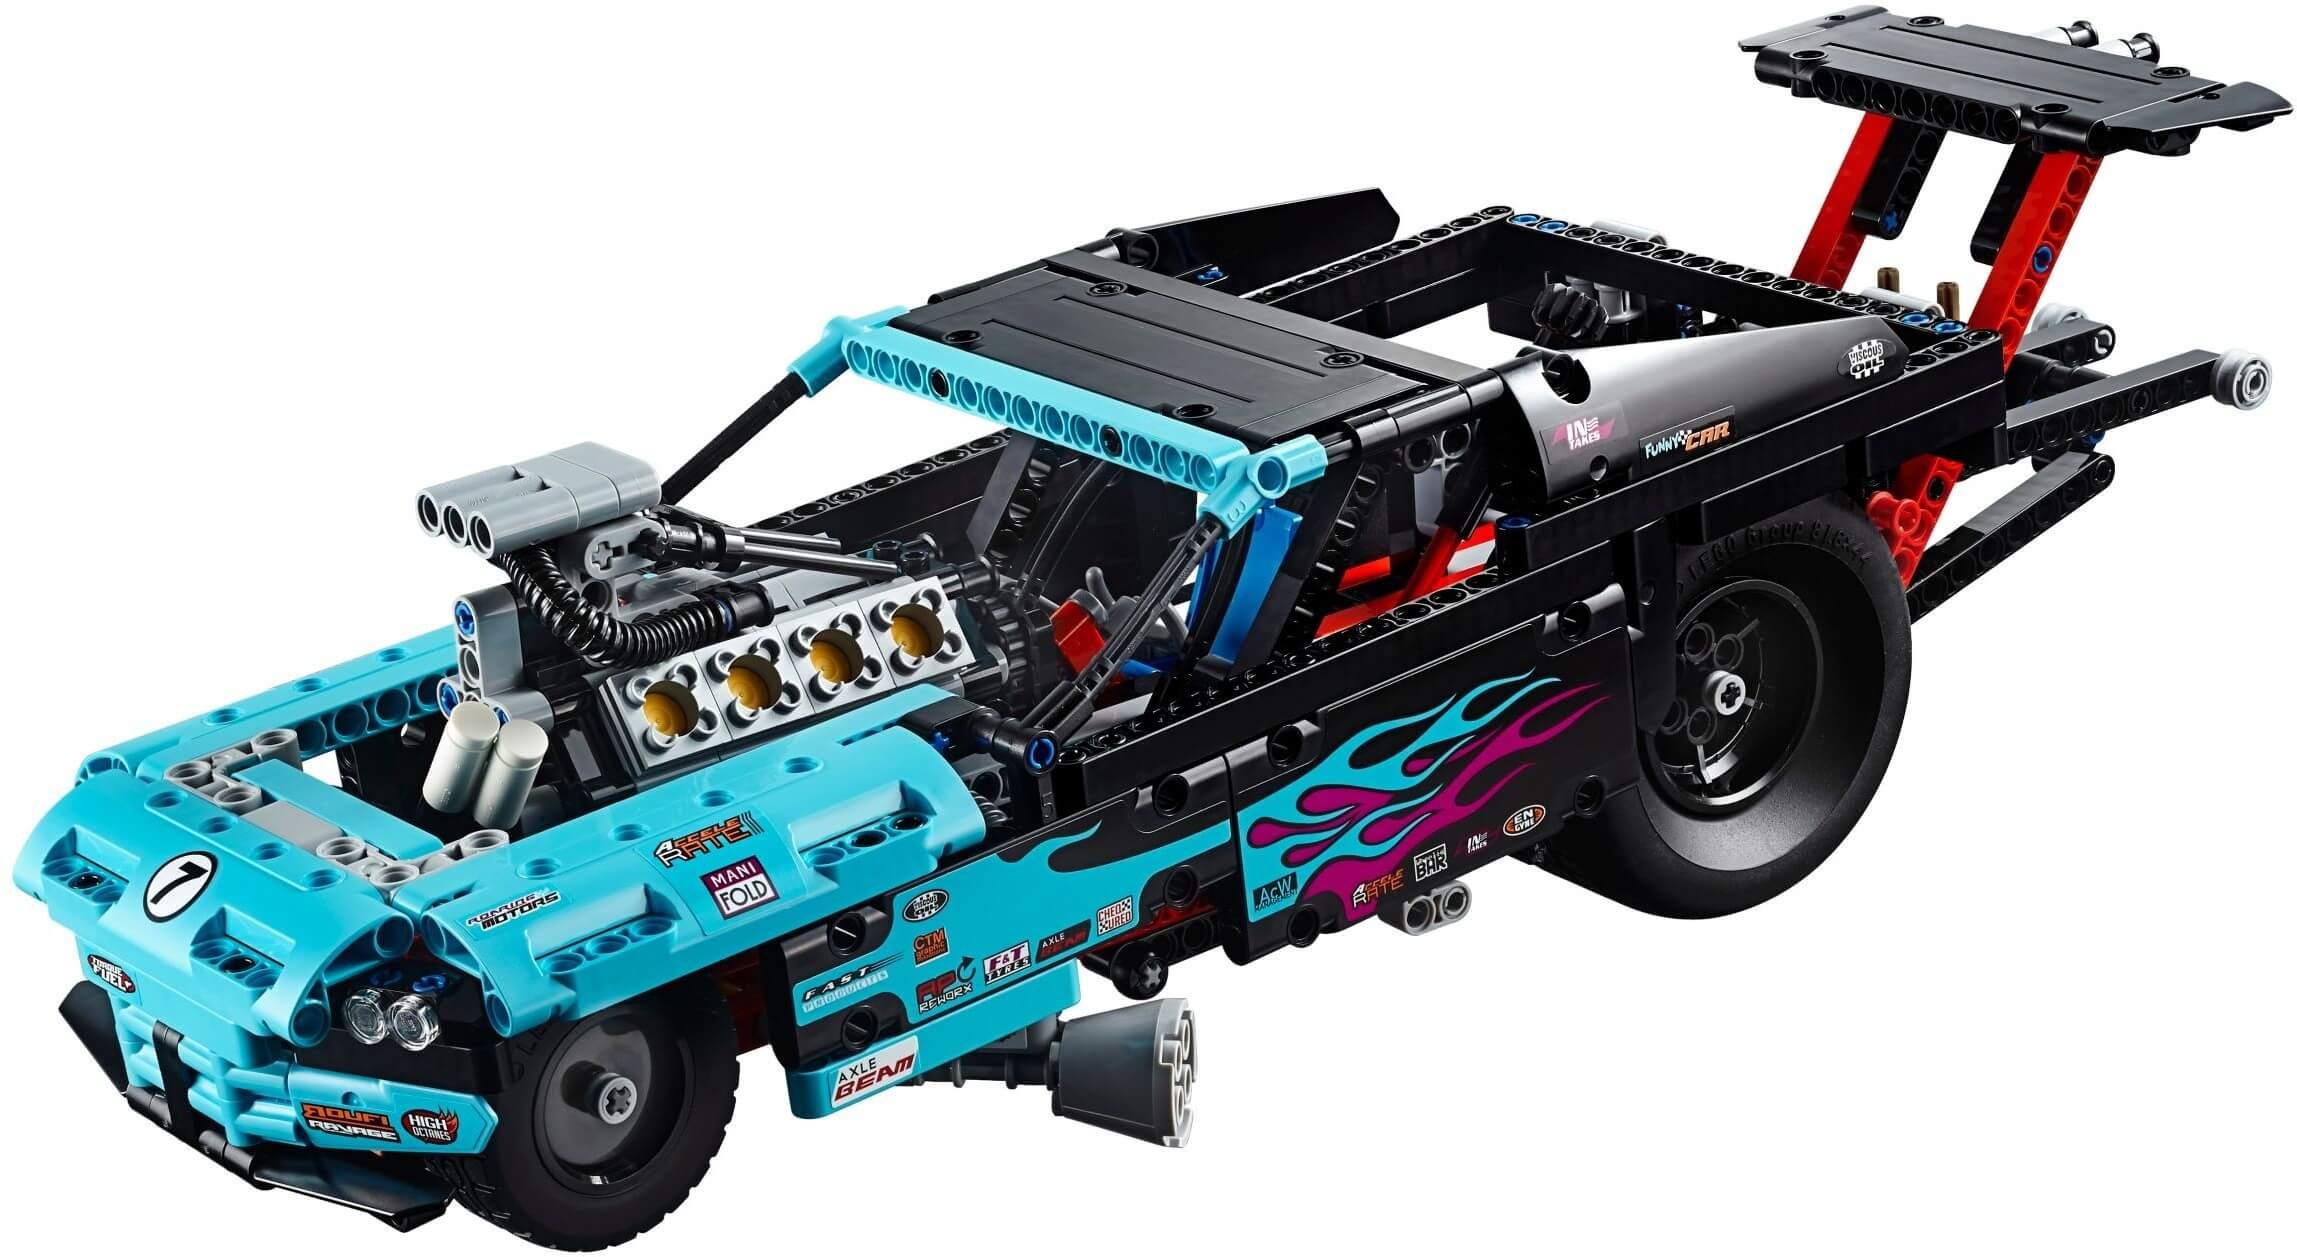 Mua đồ chơi LEGO 42050 - LEGO Technic 42050 - Xe đua cơ bắp (LEGO Technic Drag Racer 42050)